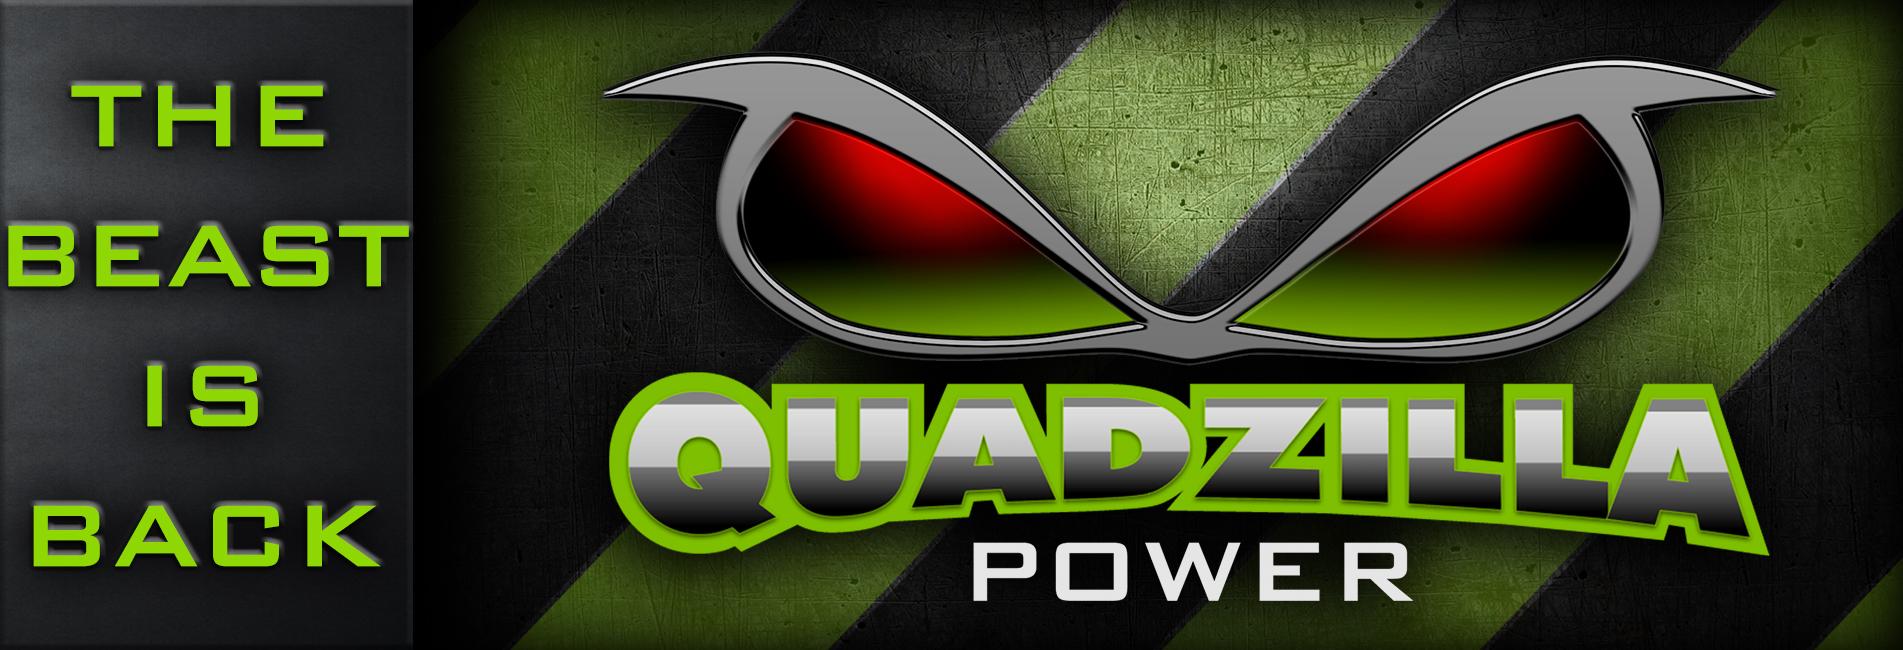 main_banner__42525?t=1503436778 quadzilla quadzilla adrenaline wiring diagram at honlapkeszites.co